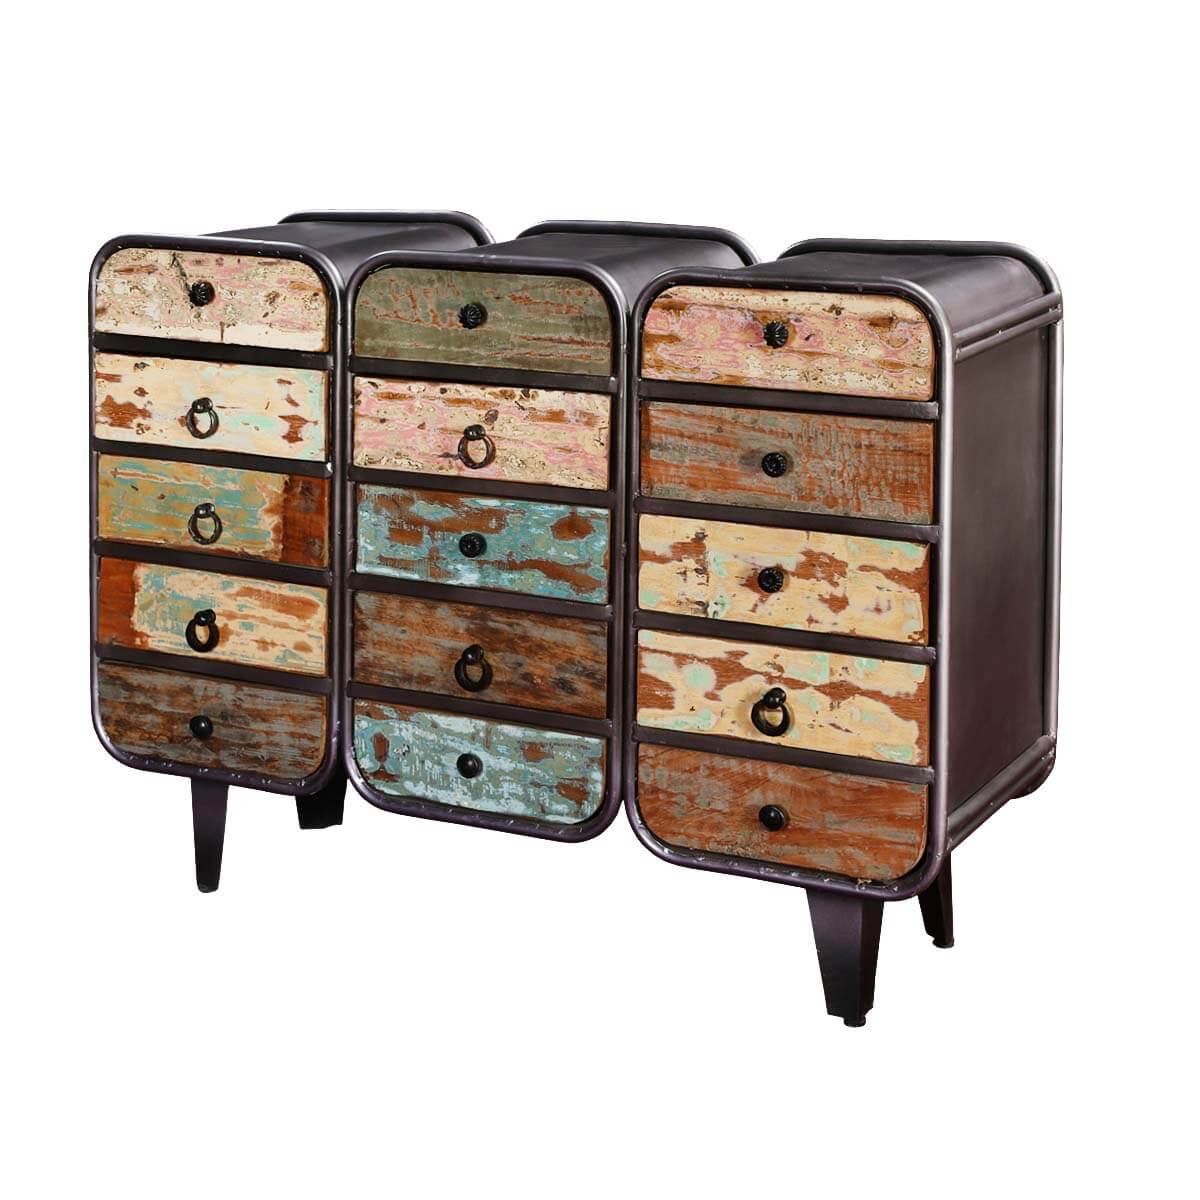 Street Rustic Mango Wood 12 Drawer Industrial Dresser